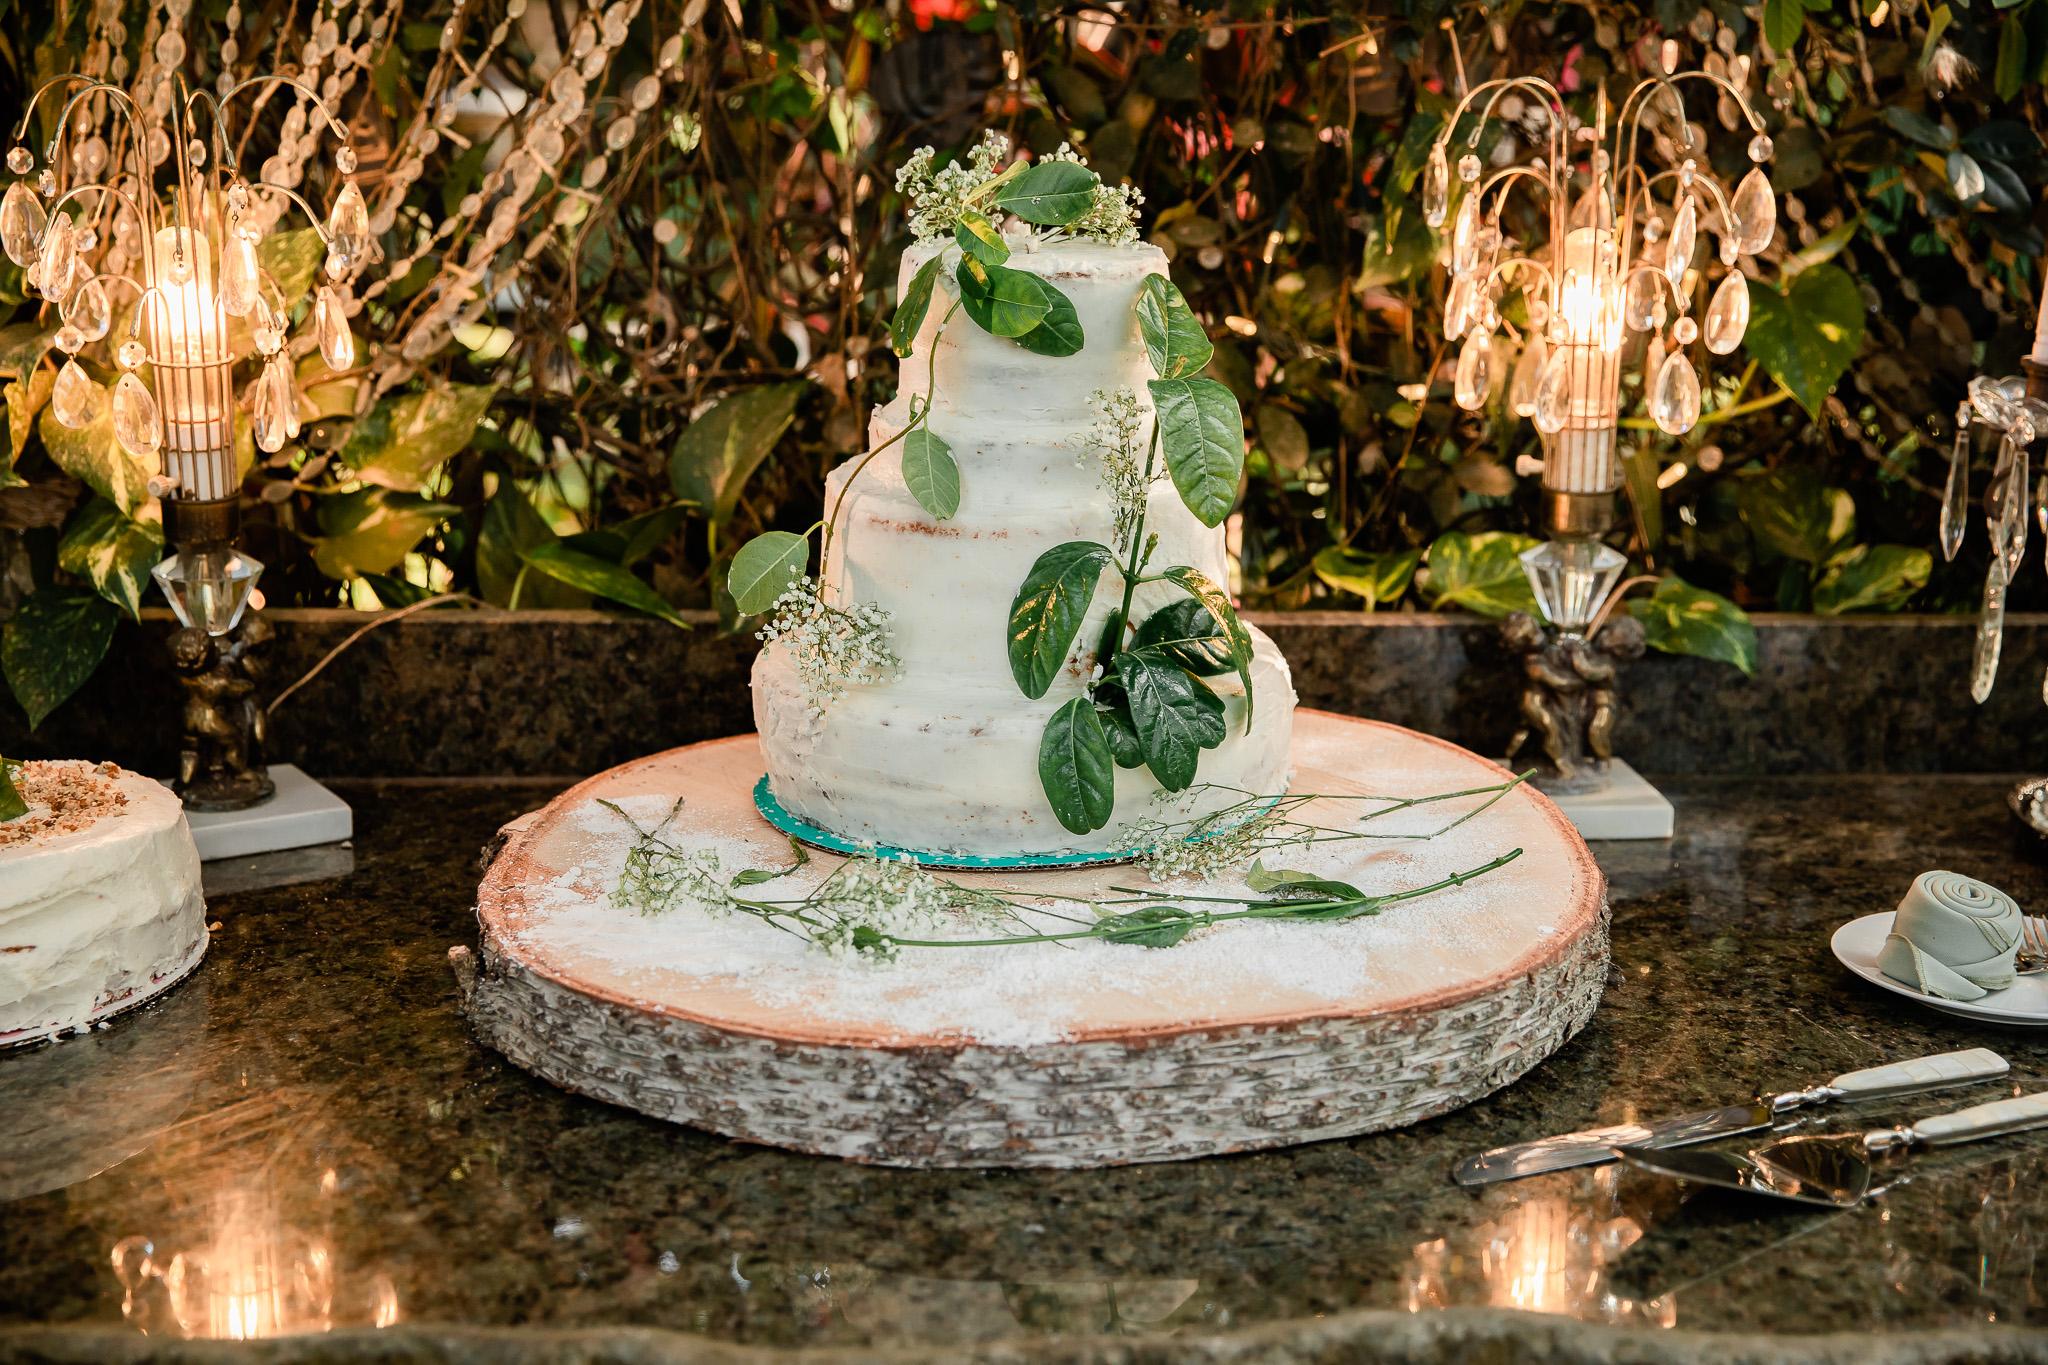 TAMPA_WEDDING_GIGIS_COUNTRY_GARDEN_CJMZ_TJP48332.jpg